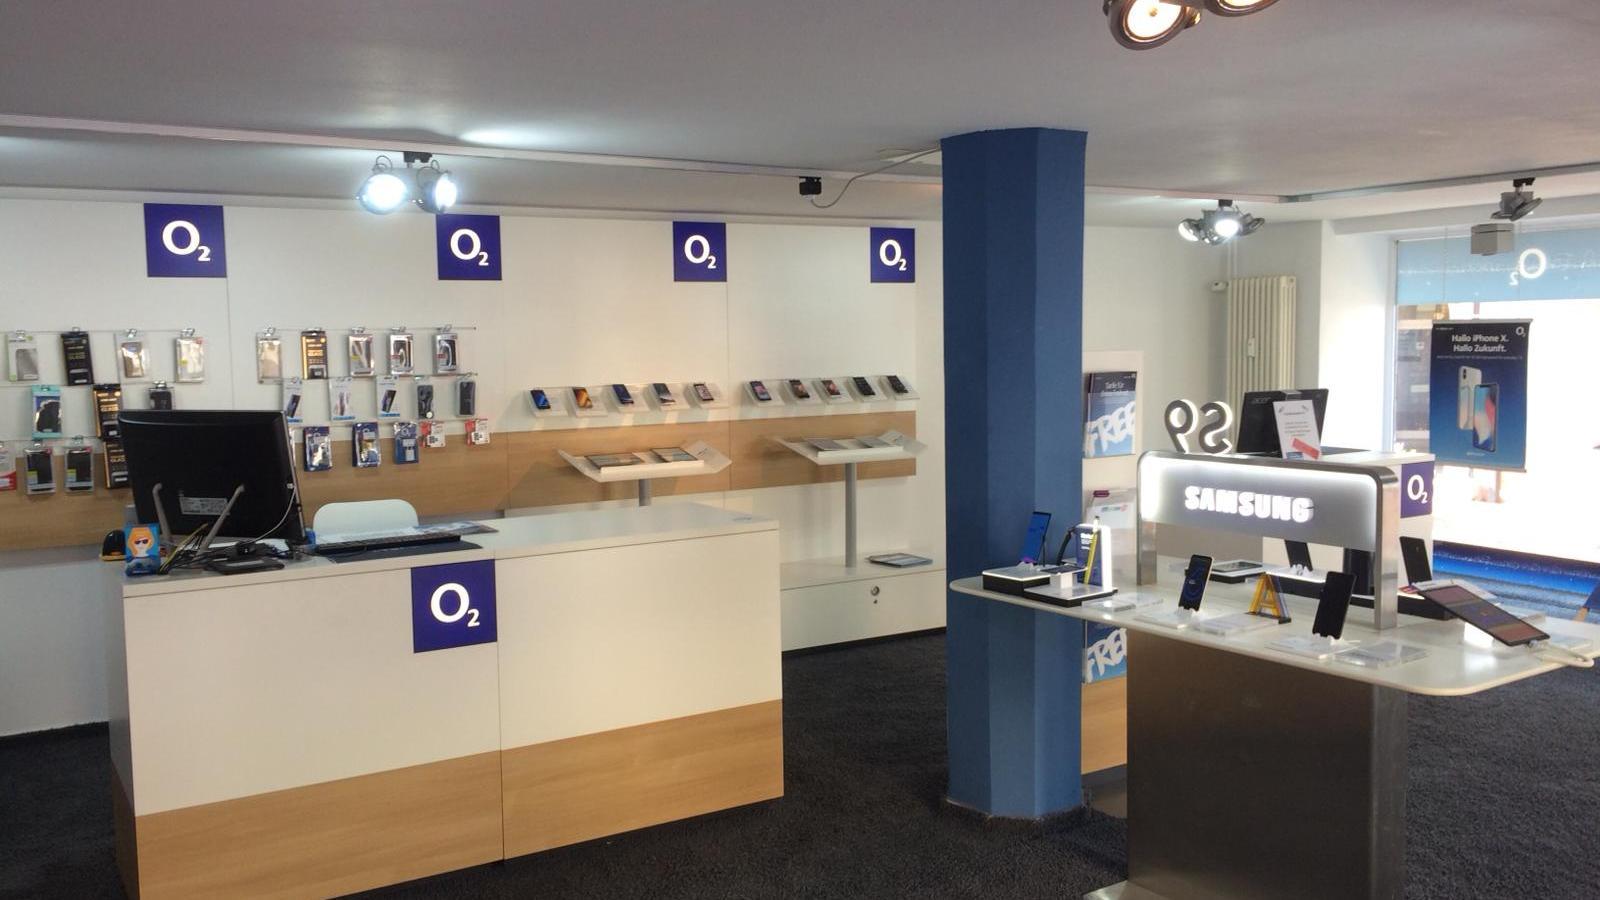 O2 / Vodafone Fachhandel, Basler Straße in Bad Krozingen